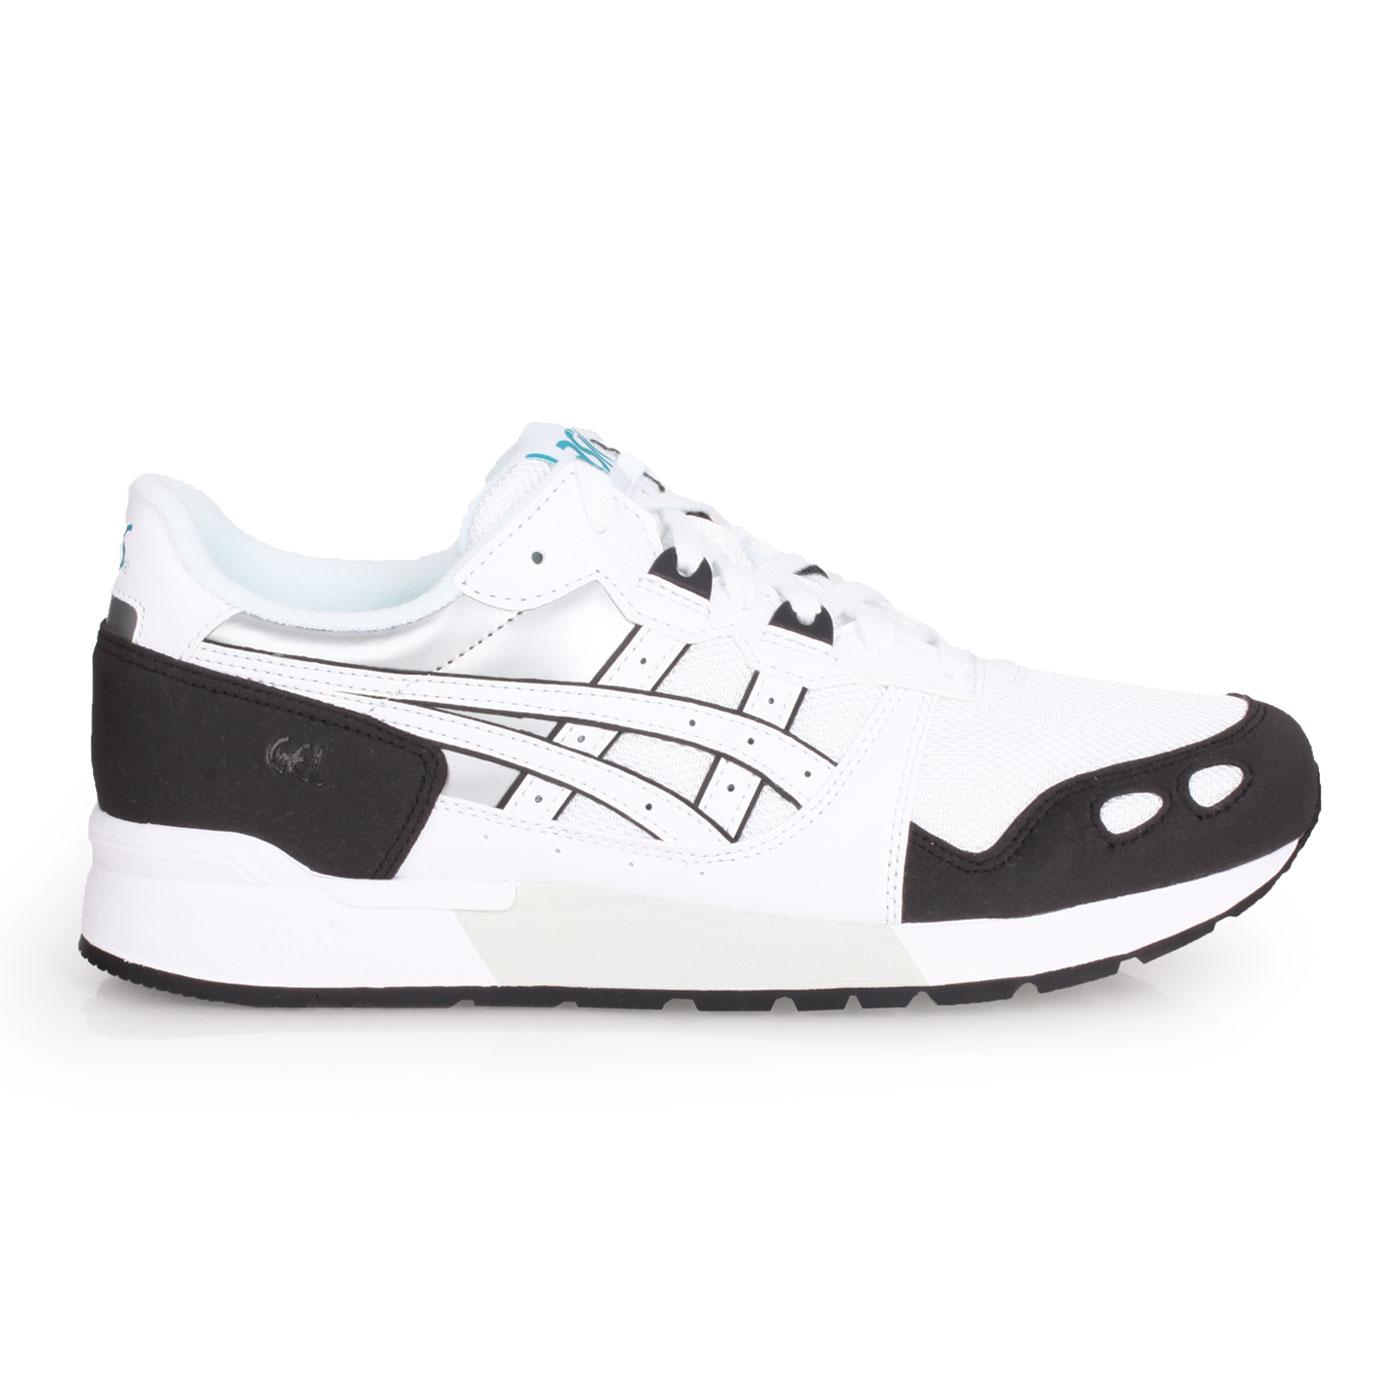 ASICS 男款休閒運動鞋  @GEL-LYTE@1191A024-100 - 白黑